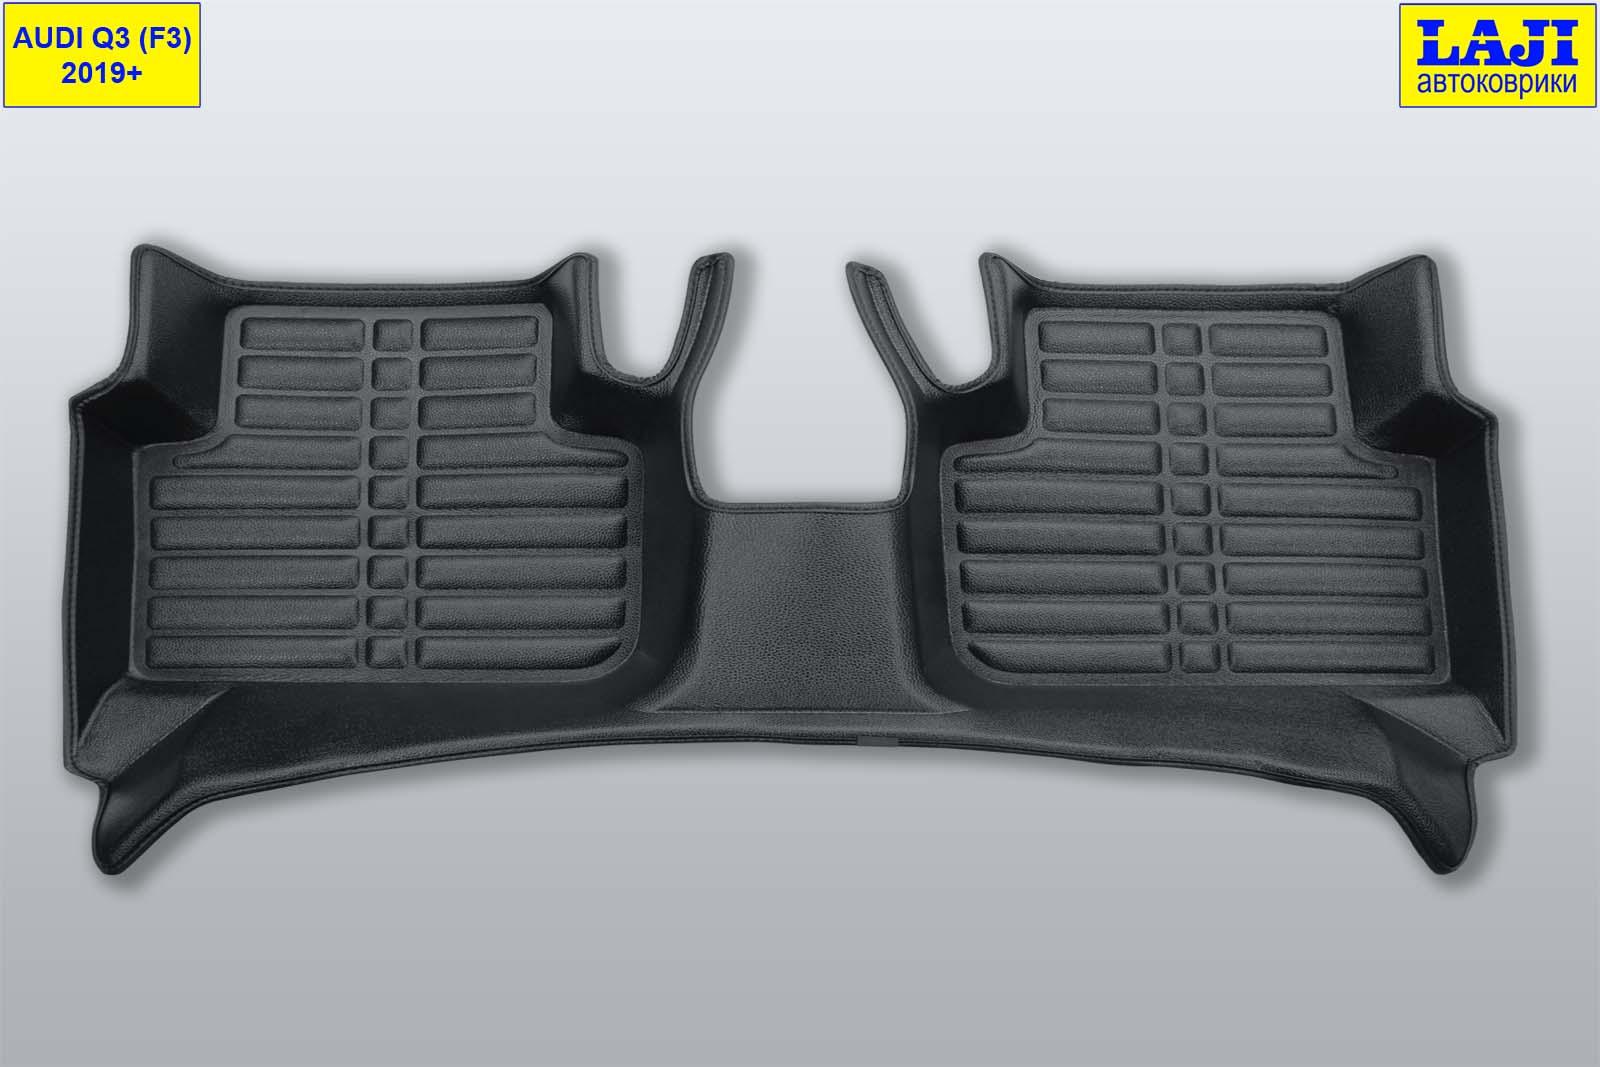 5D коврики для Audi Q3 F3 2019-н.в. 10